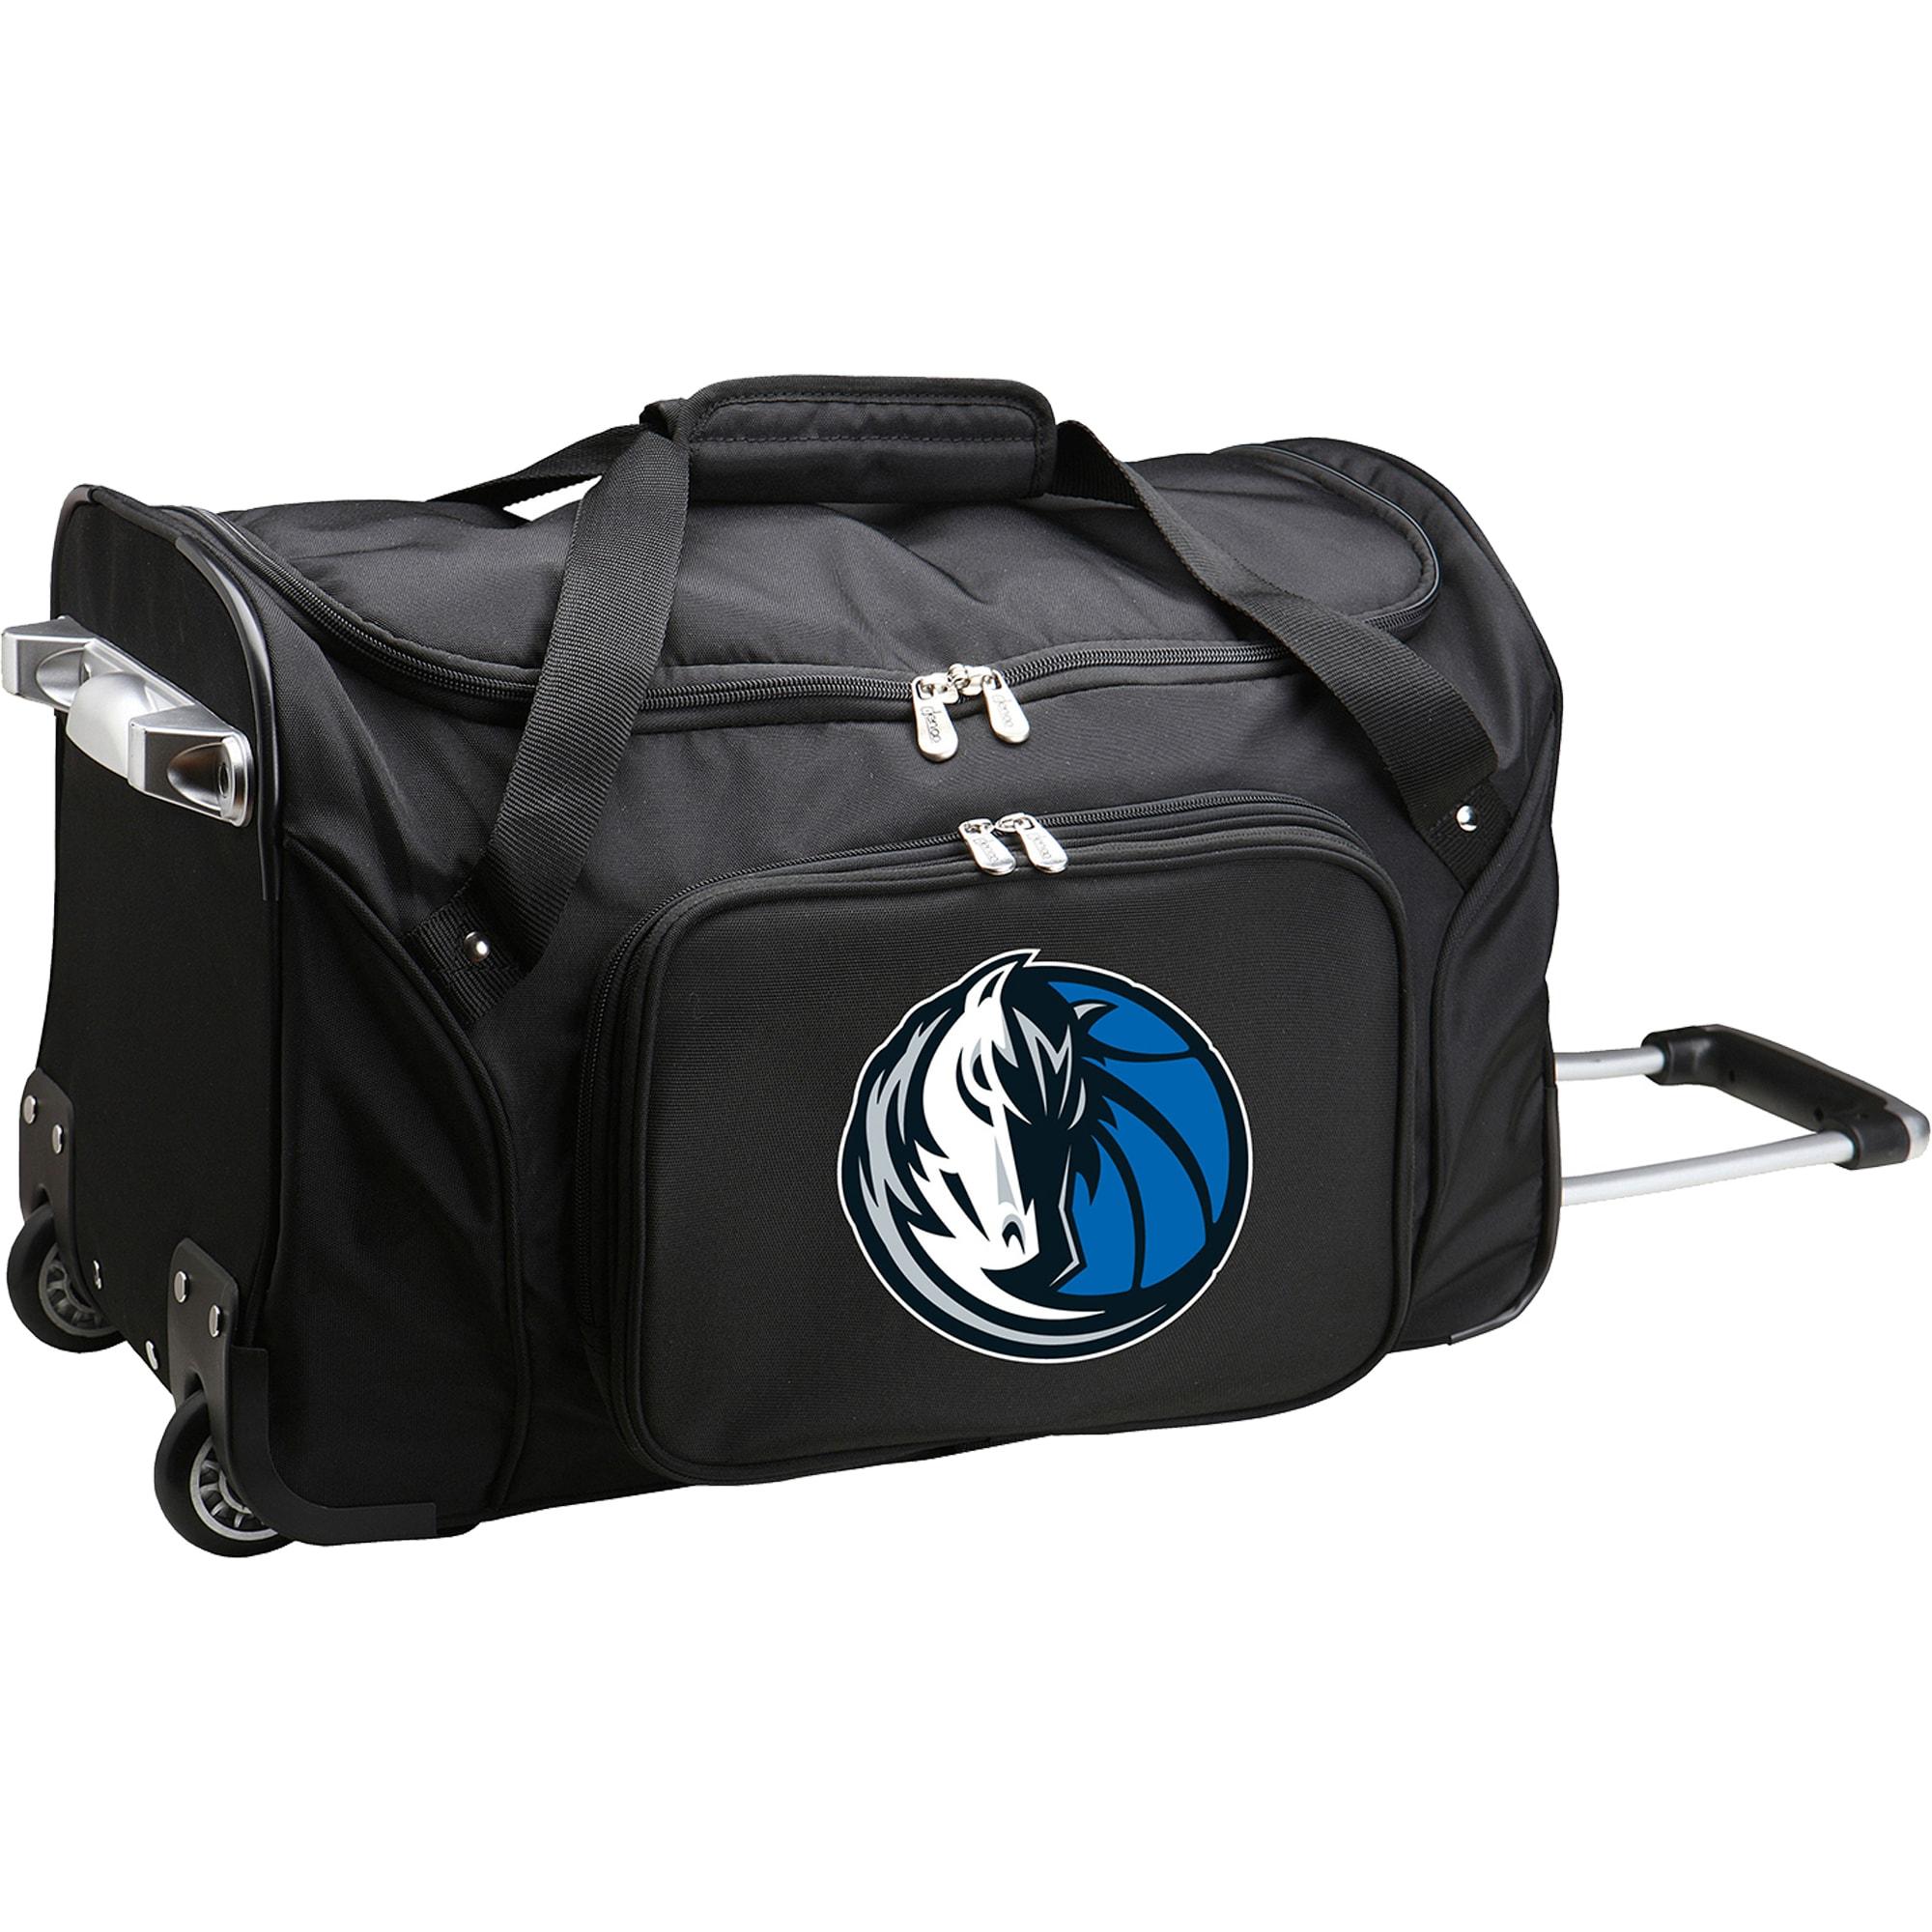 "Dallas Mavericks 22"" 2-Wheeled Duffel Bag - Black"